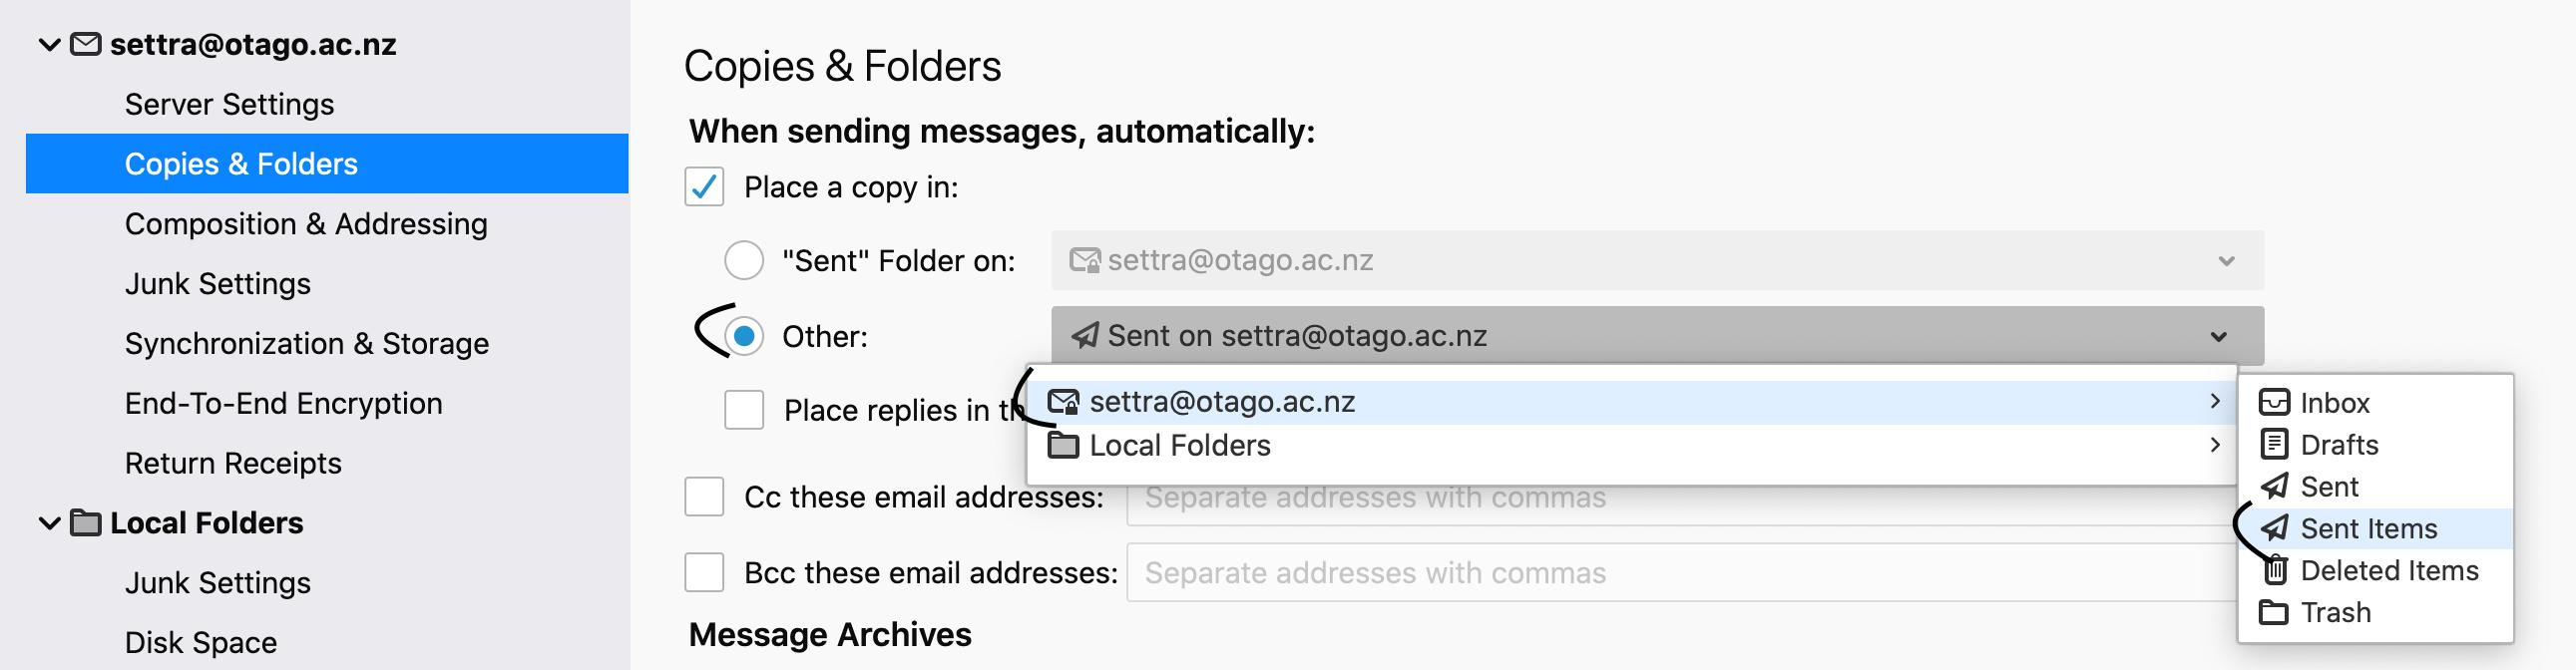 screenshot of step 7 Copies and Folders tab in Microsoft 365 - sending messages